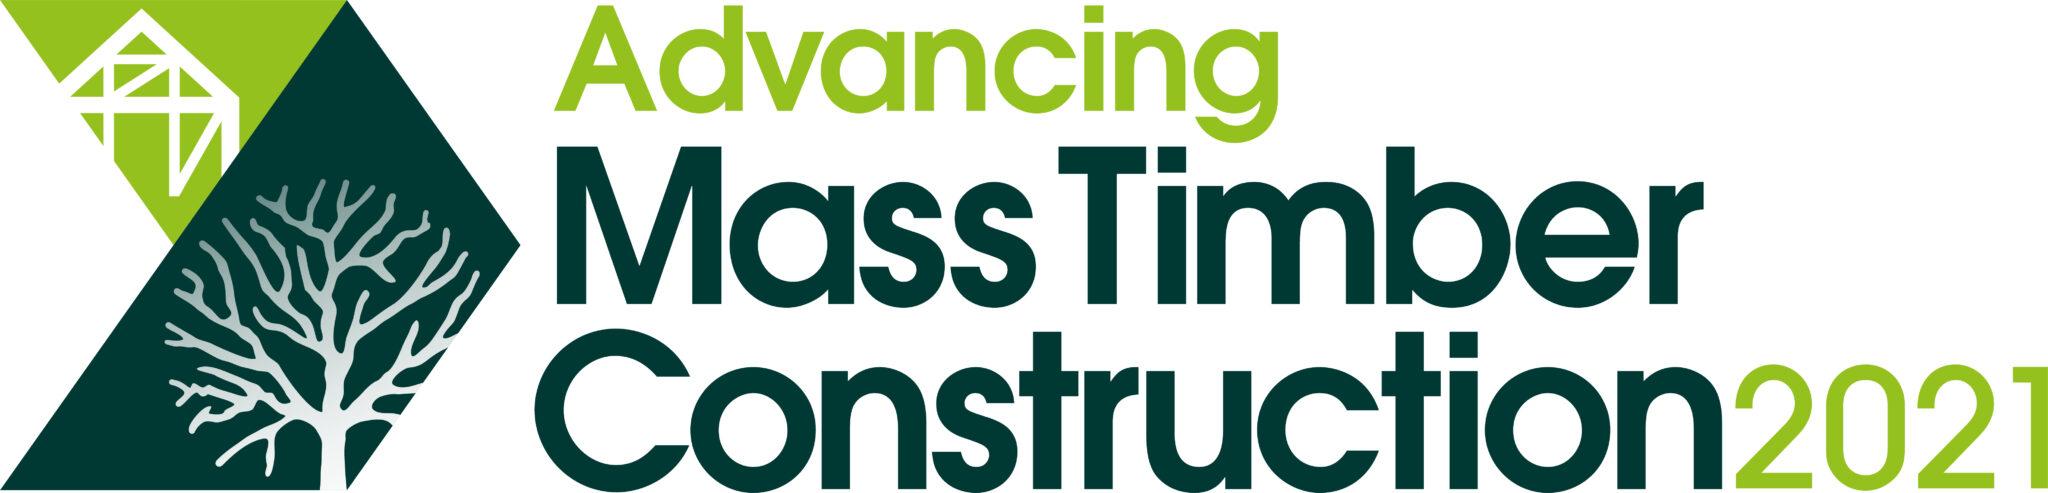 HW200122-Advancing-Mass-Timber-Construction-2021-logo-2048x493